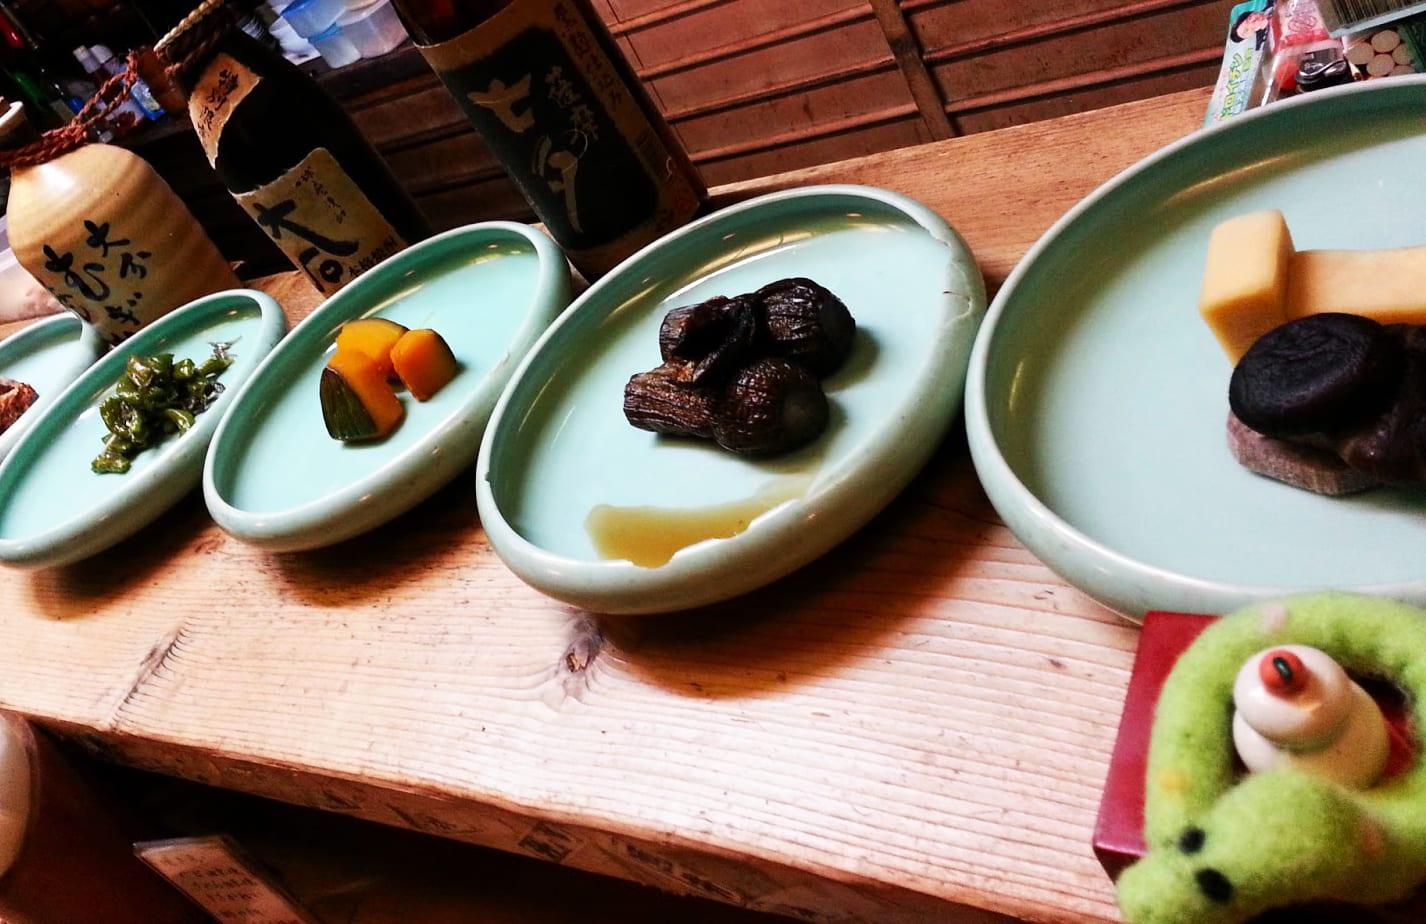 pickled vegetables on offer in a little back alley bar off Ponto-ch?